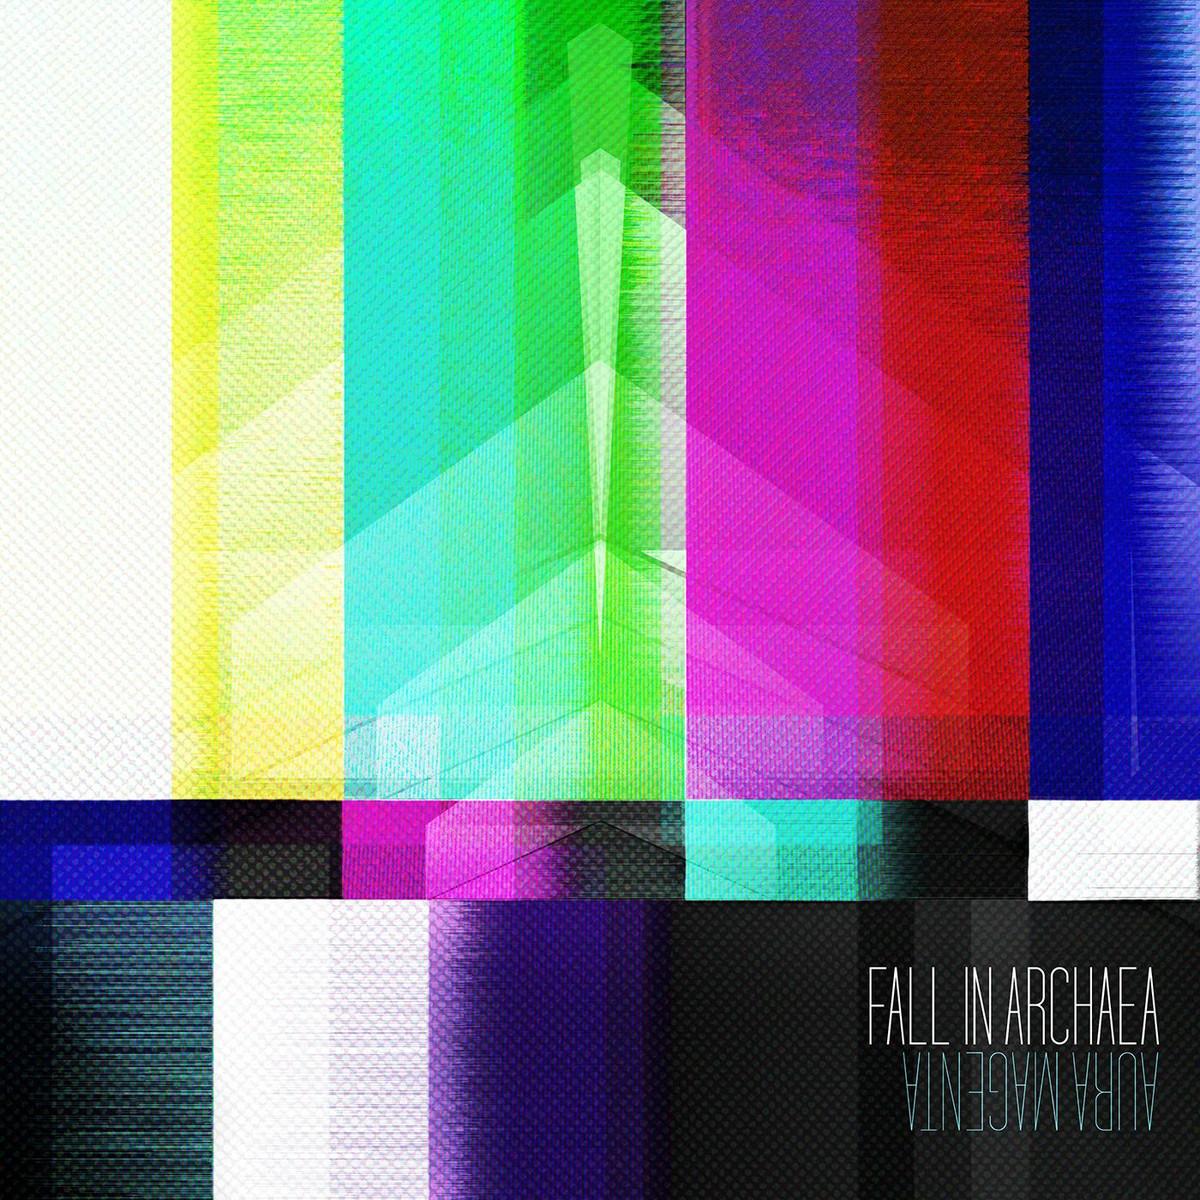 Fall In Archaea - Aura Magenta (2013)